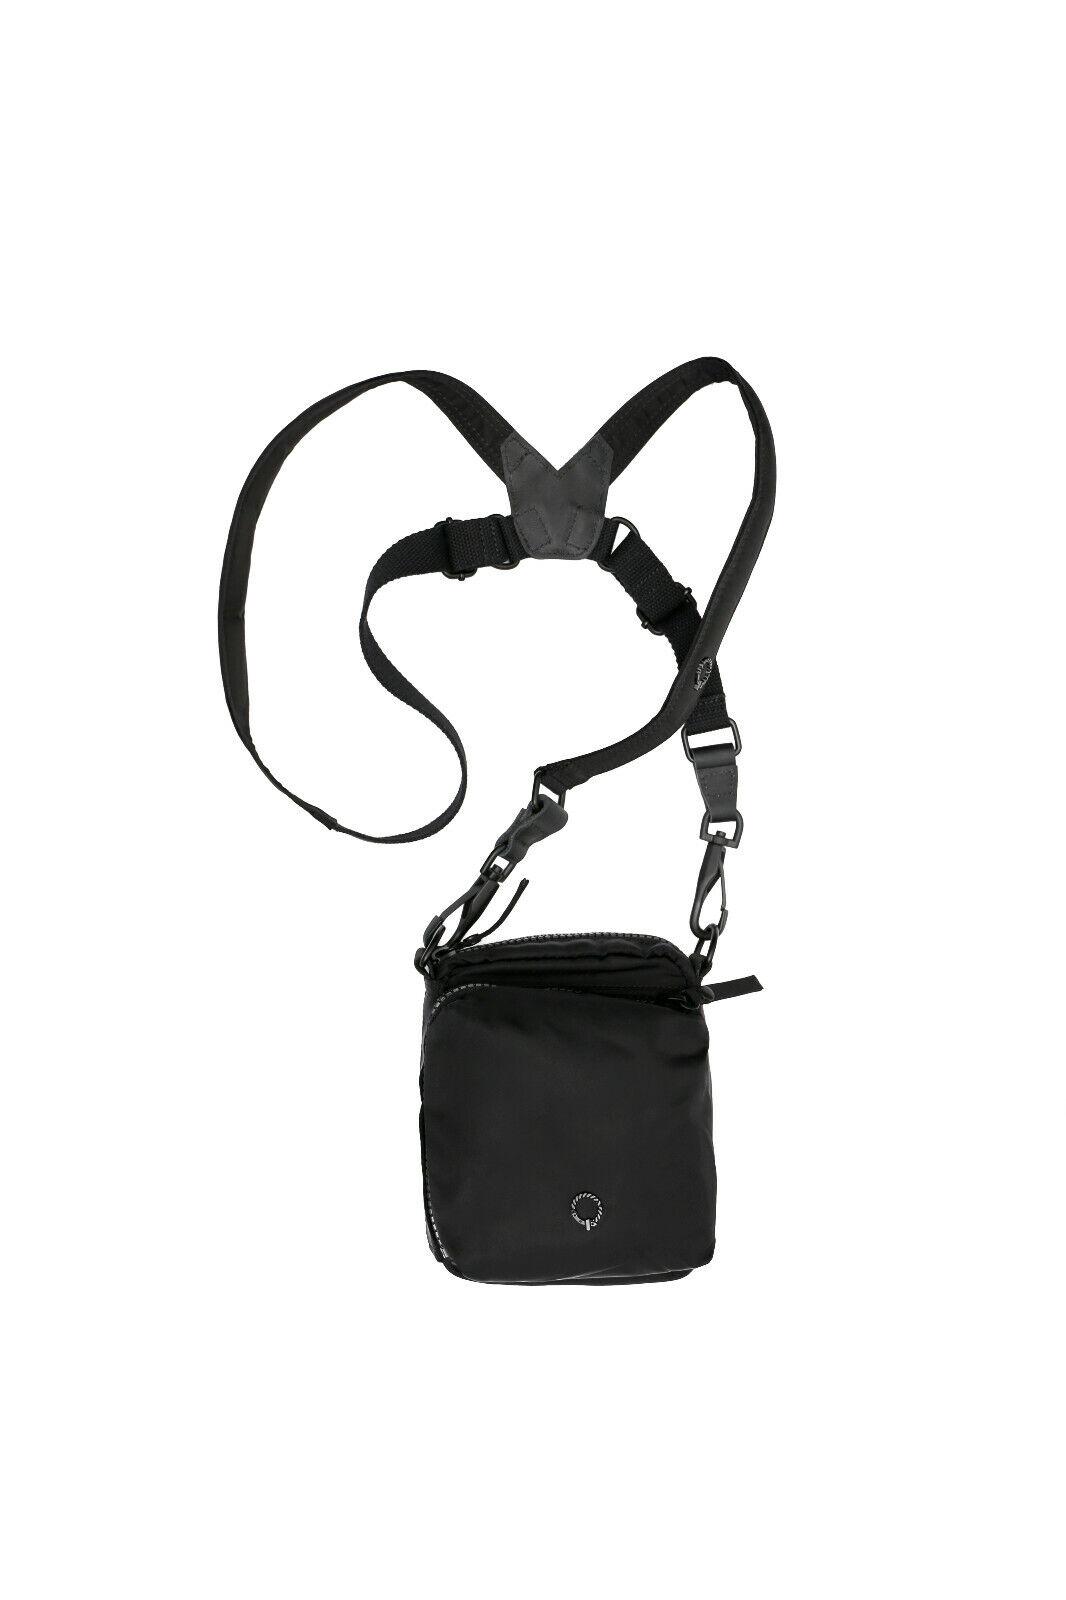 Stighlorgan Callahan Holster Bag In Black HD210D Nylon. Cross Body Chest Rig